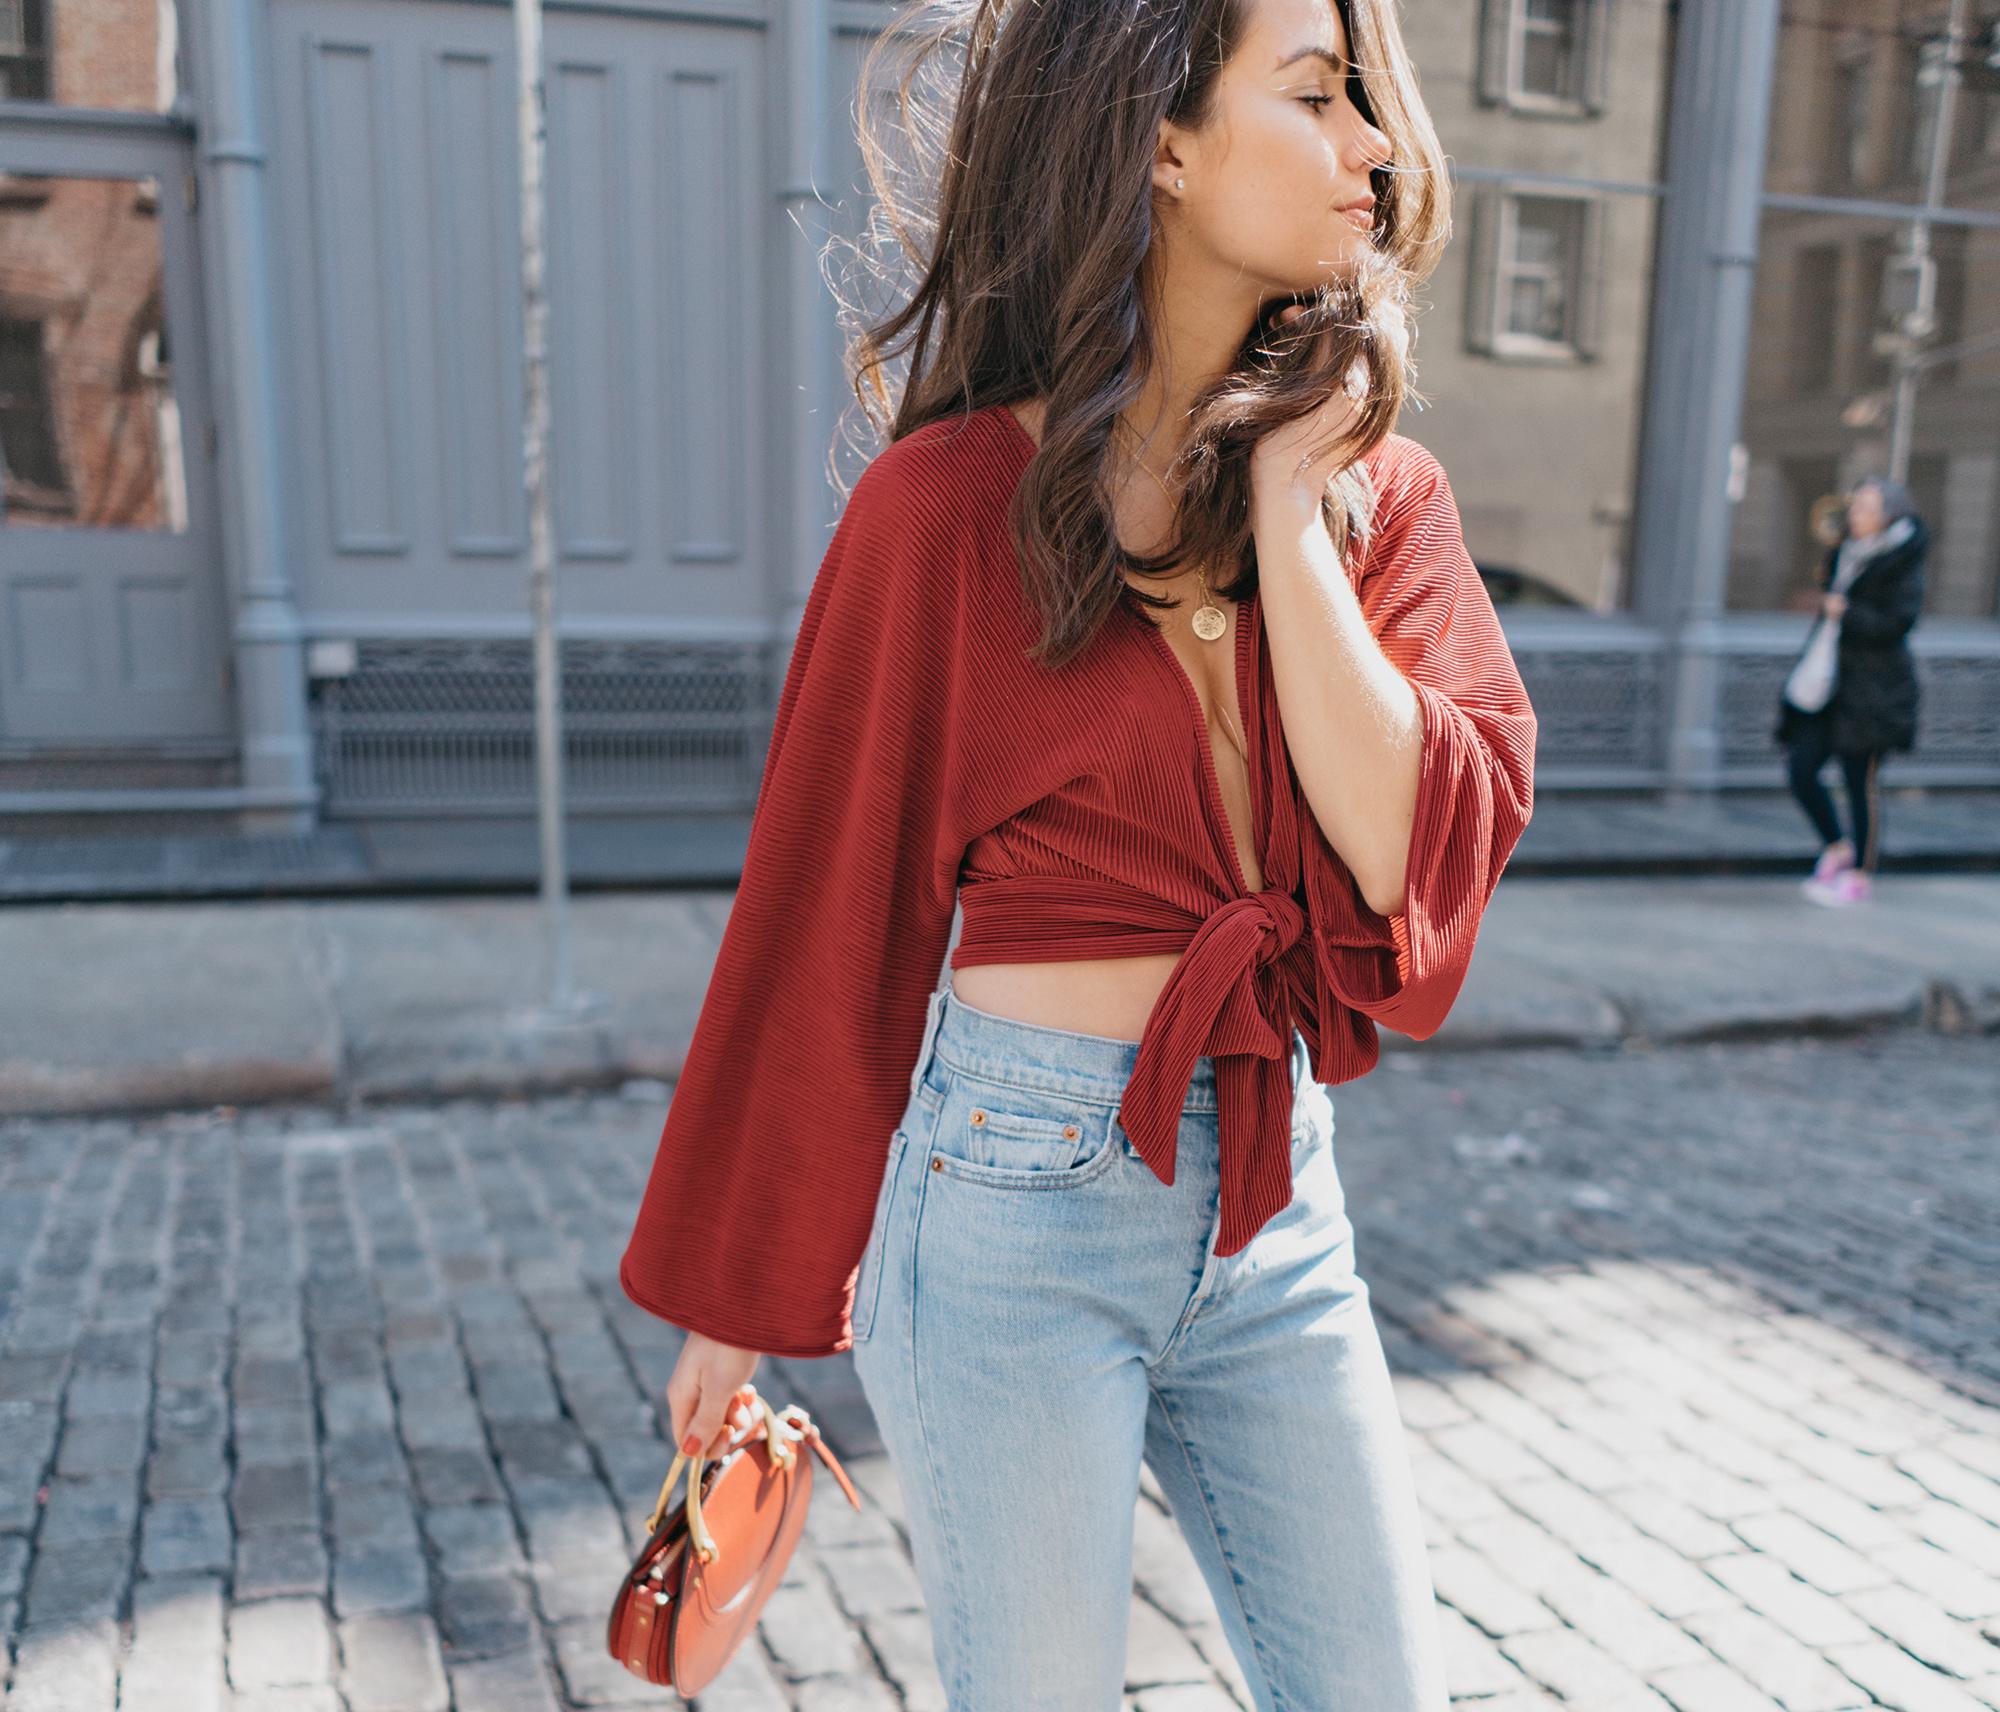 Red-Kimono-Tie-Front-Top-Ruby-Chloe-Pixie-Leather-Crossbody-Bag-7.jpg